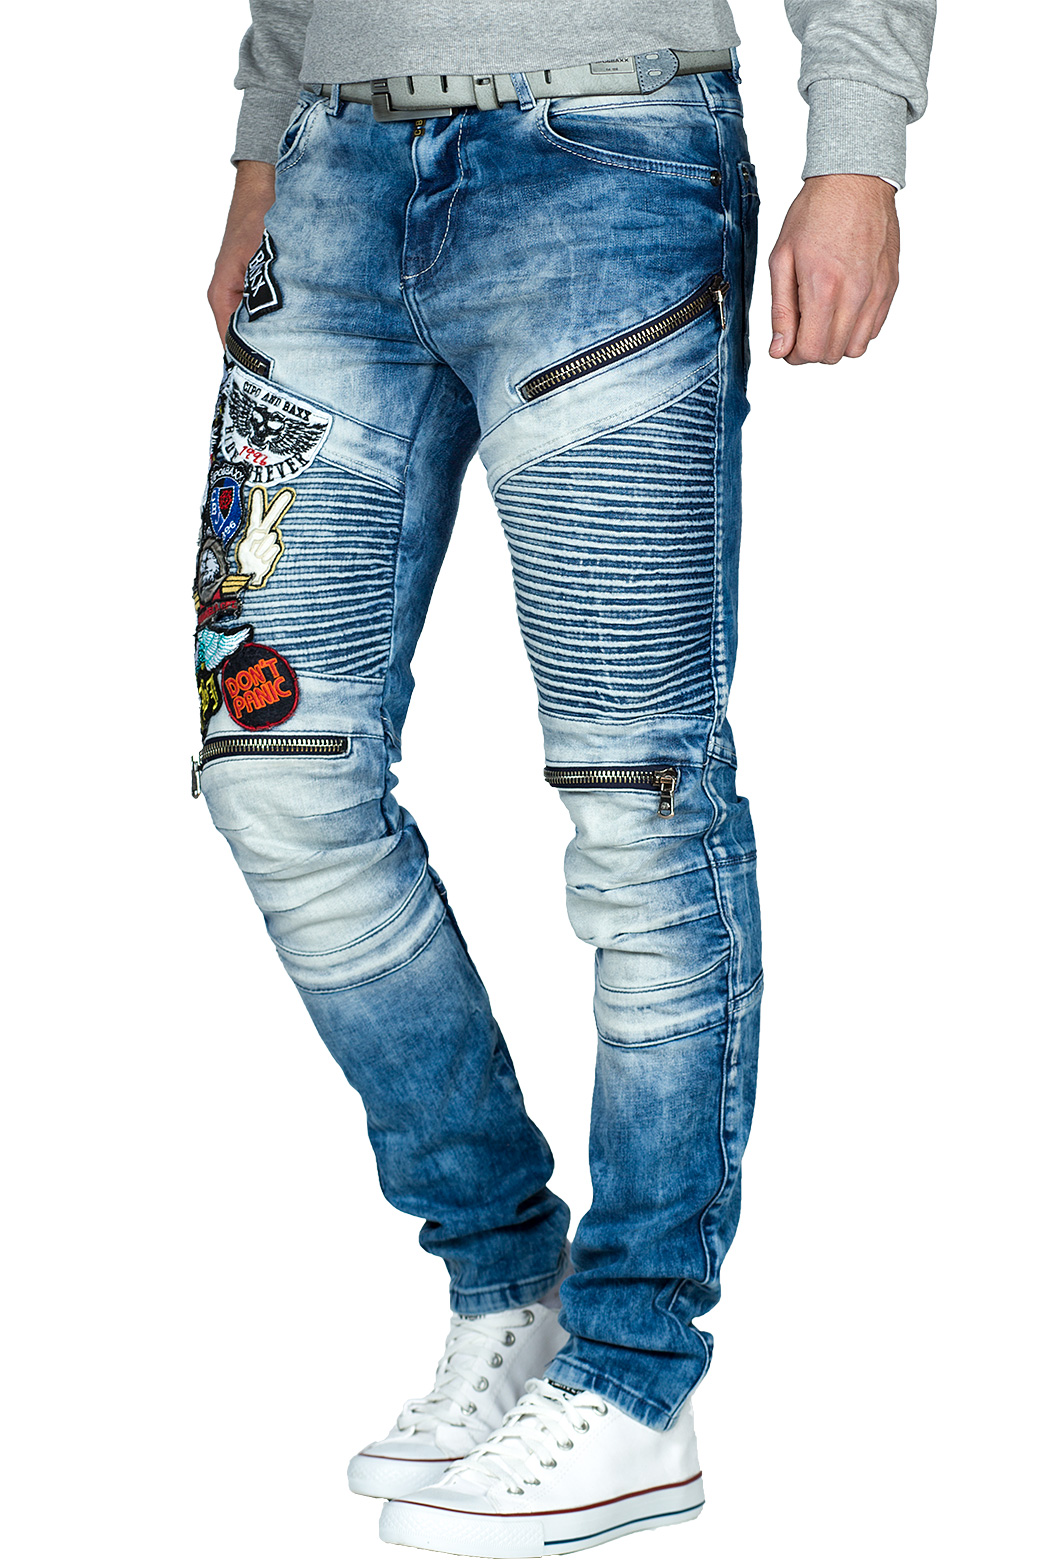 Cipo-amp-Baxx-Uomo-Jeans-Pantaloni-ricamate-Biker-Style-streetwear-nervature-pattern-Dope miniatura 36